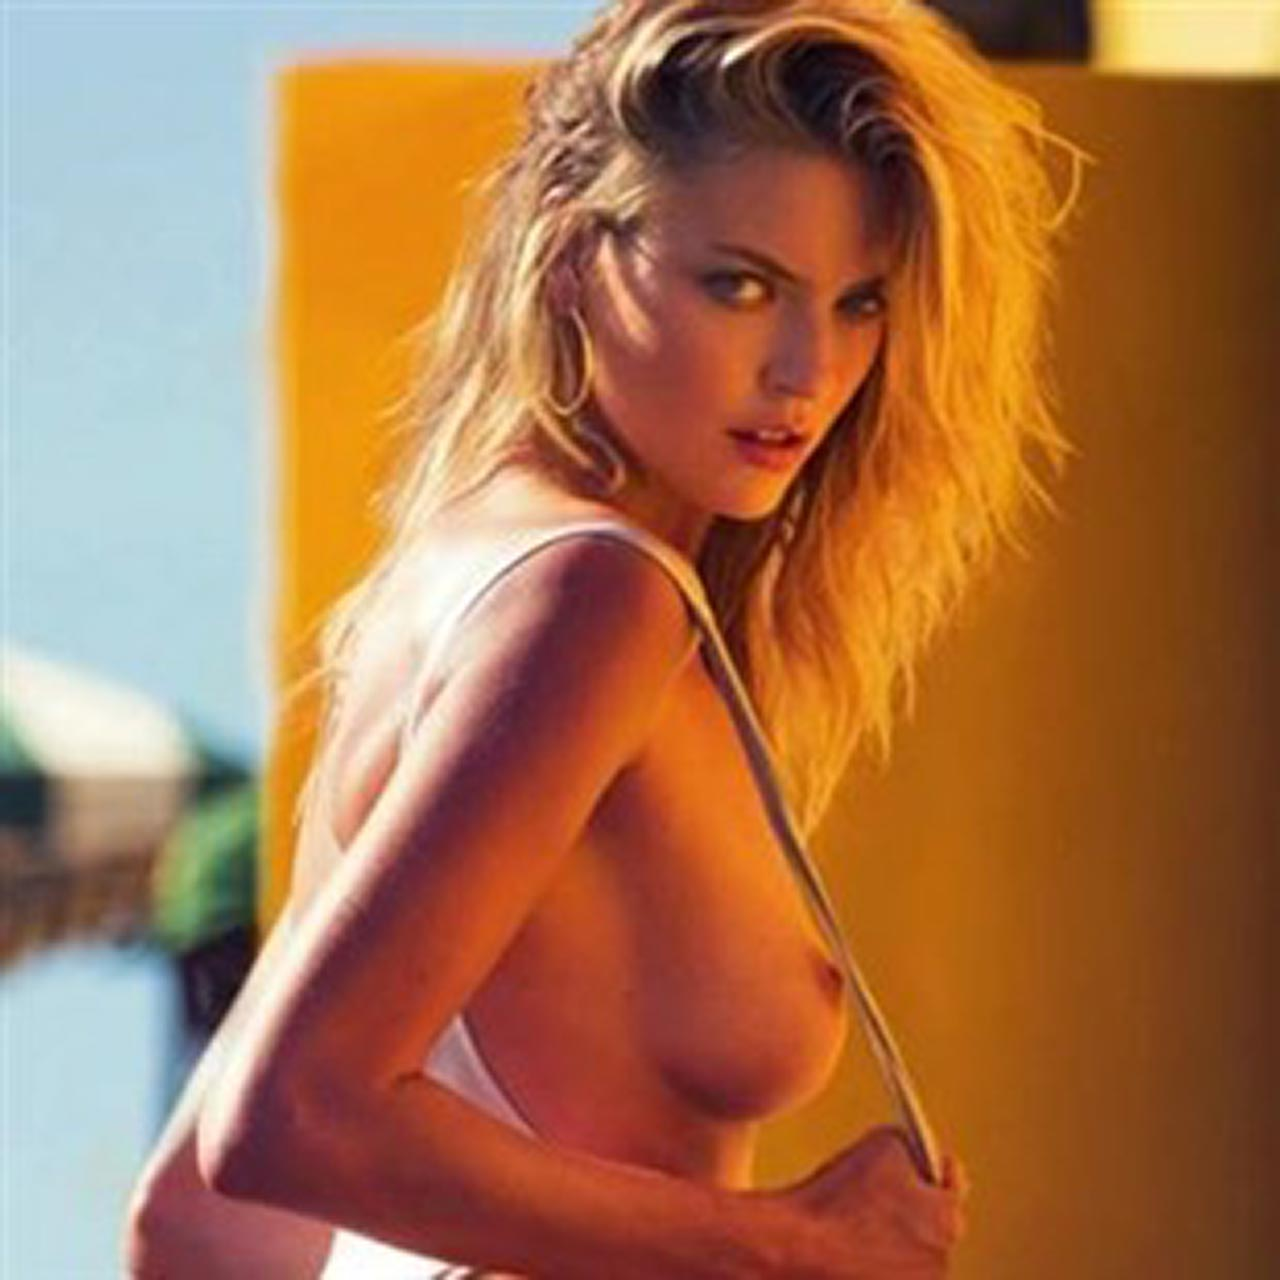 of photo hunt erotic Video